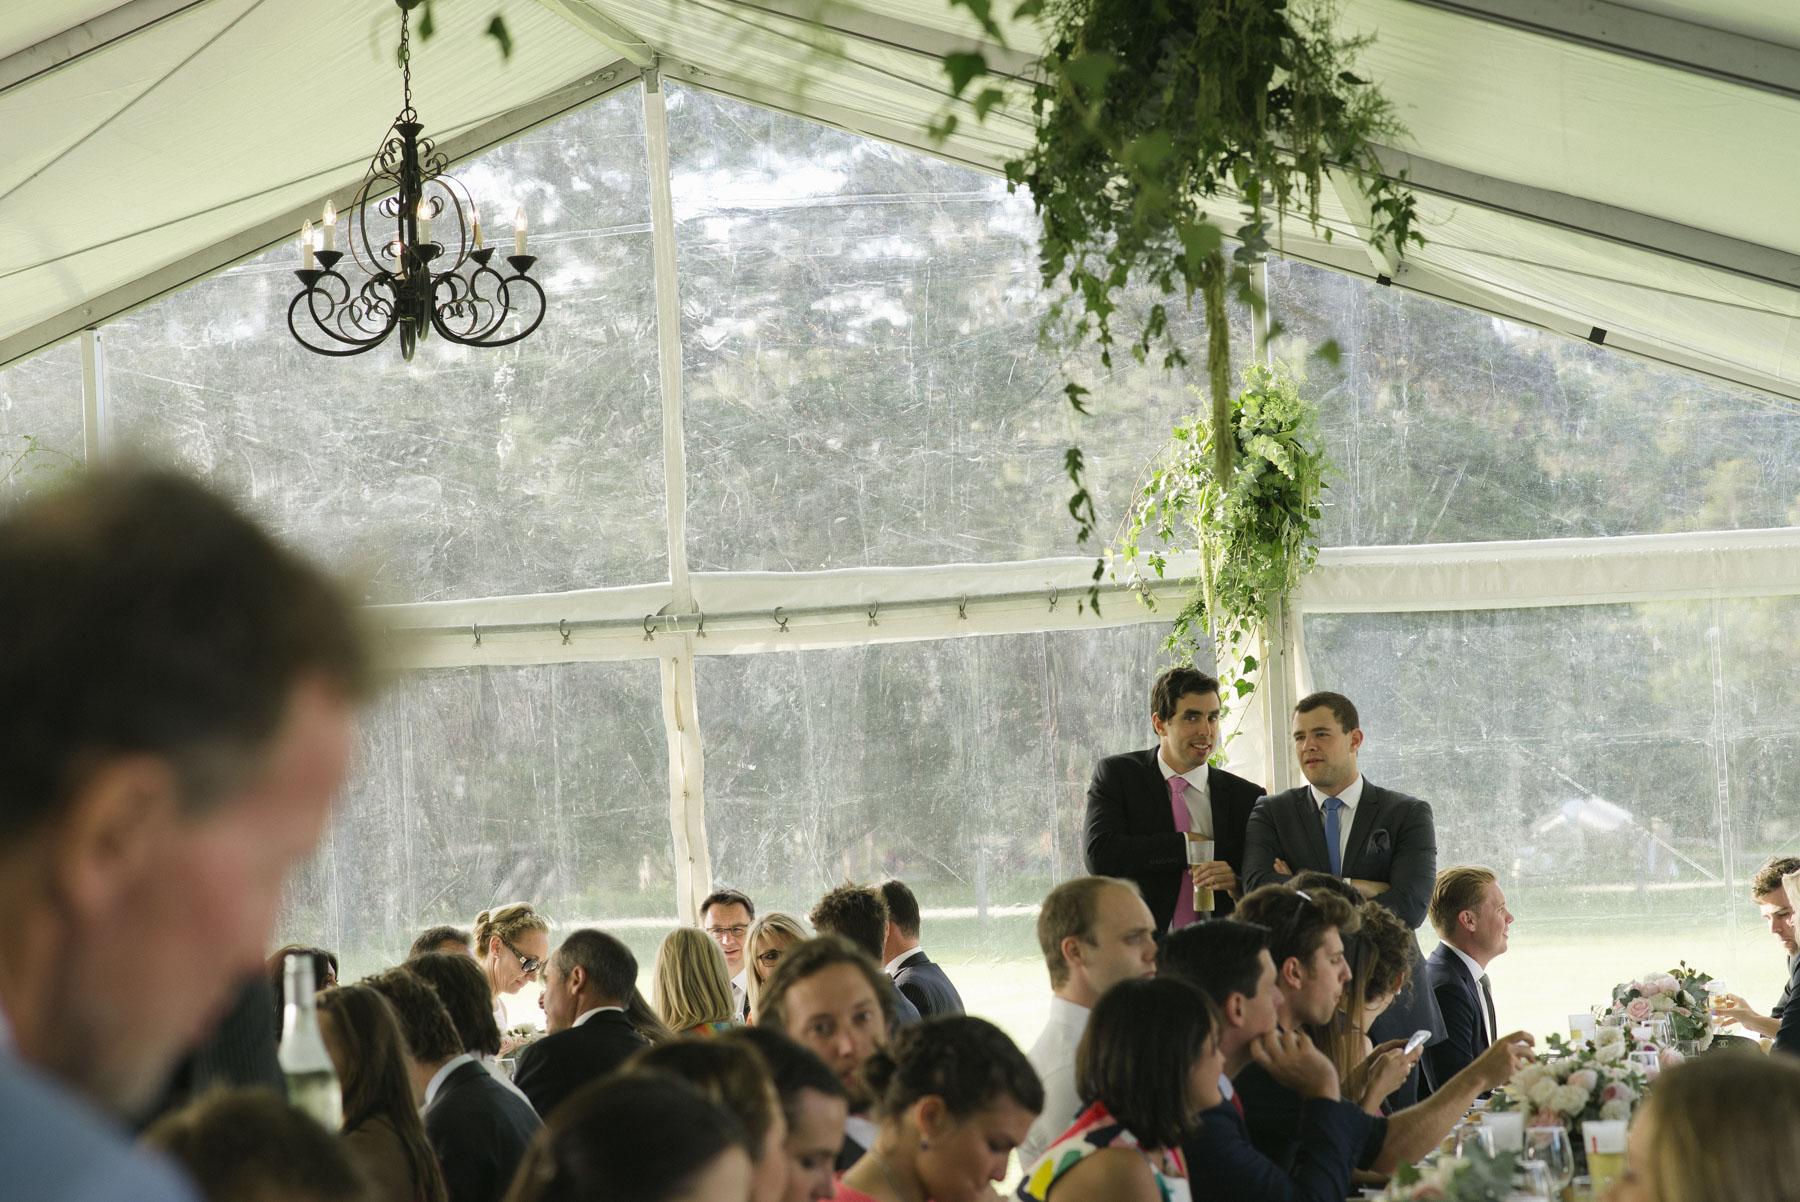 1501vand-310alan_moyle_wedding_portrait_brighton_bayside_werribee_estate_mansion_zoo_rustic_styled_garden_mansion_candid_documentry_victoria_whitelaw.jpg